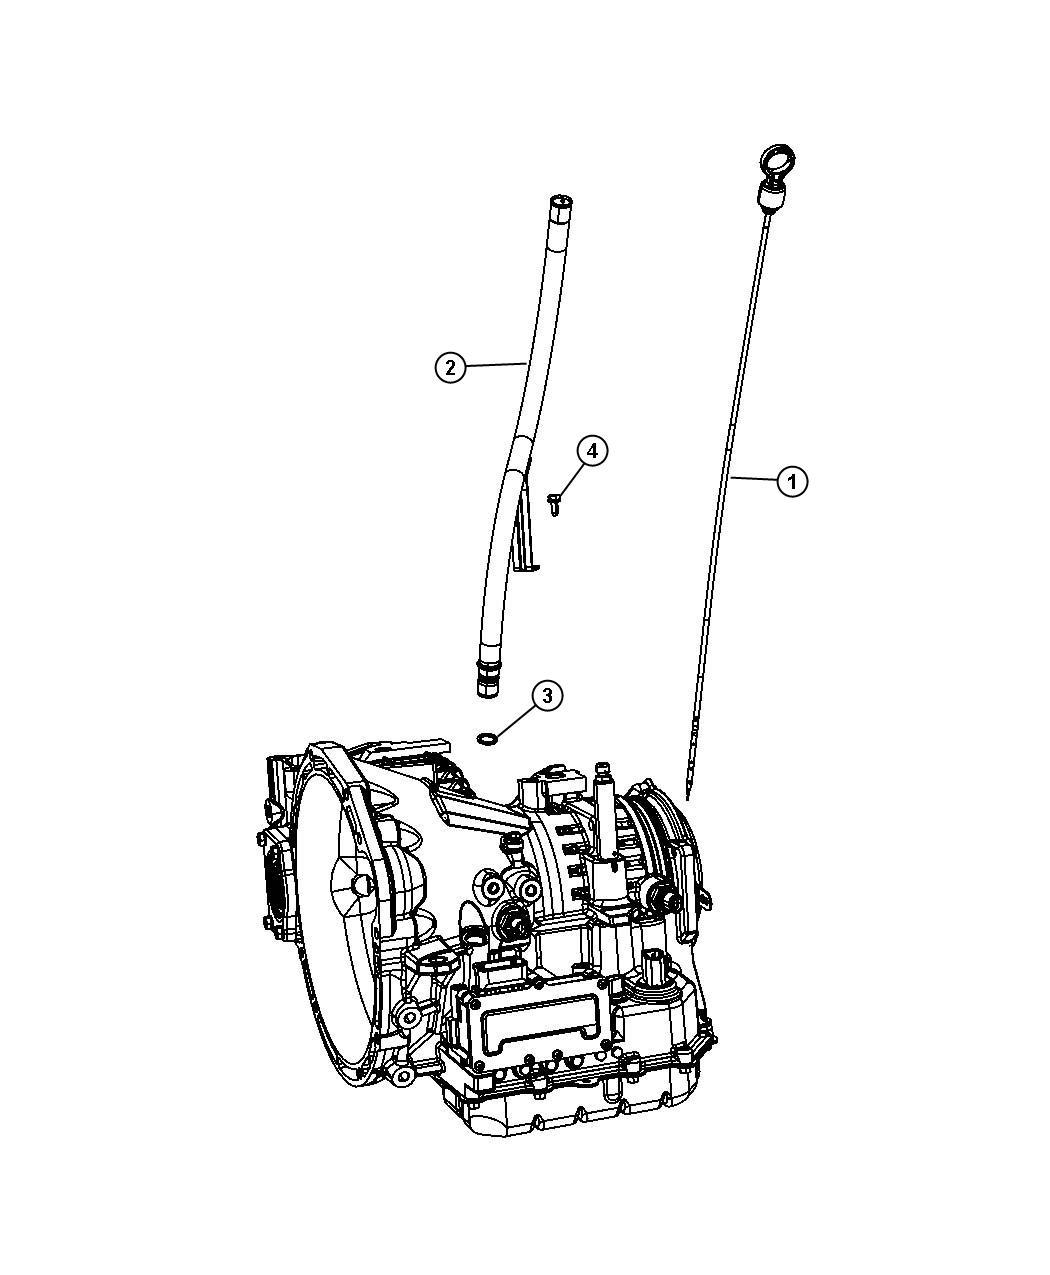 Dodge Avenger Indicator. Transmission fluid level. Oil